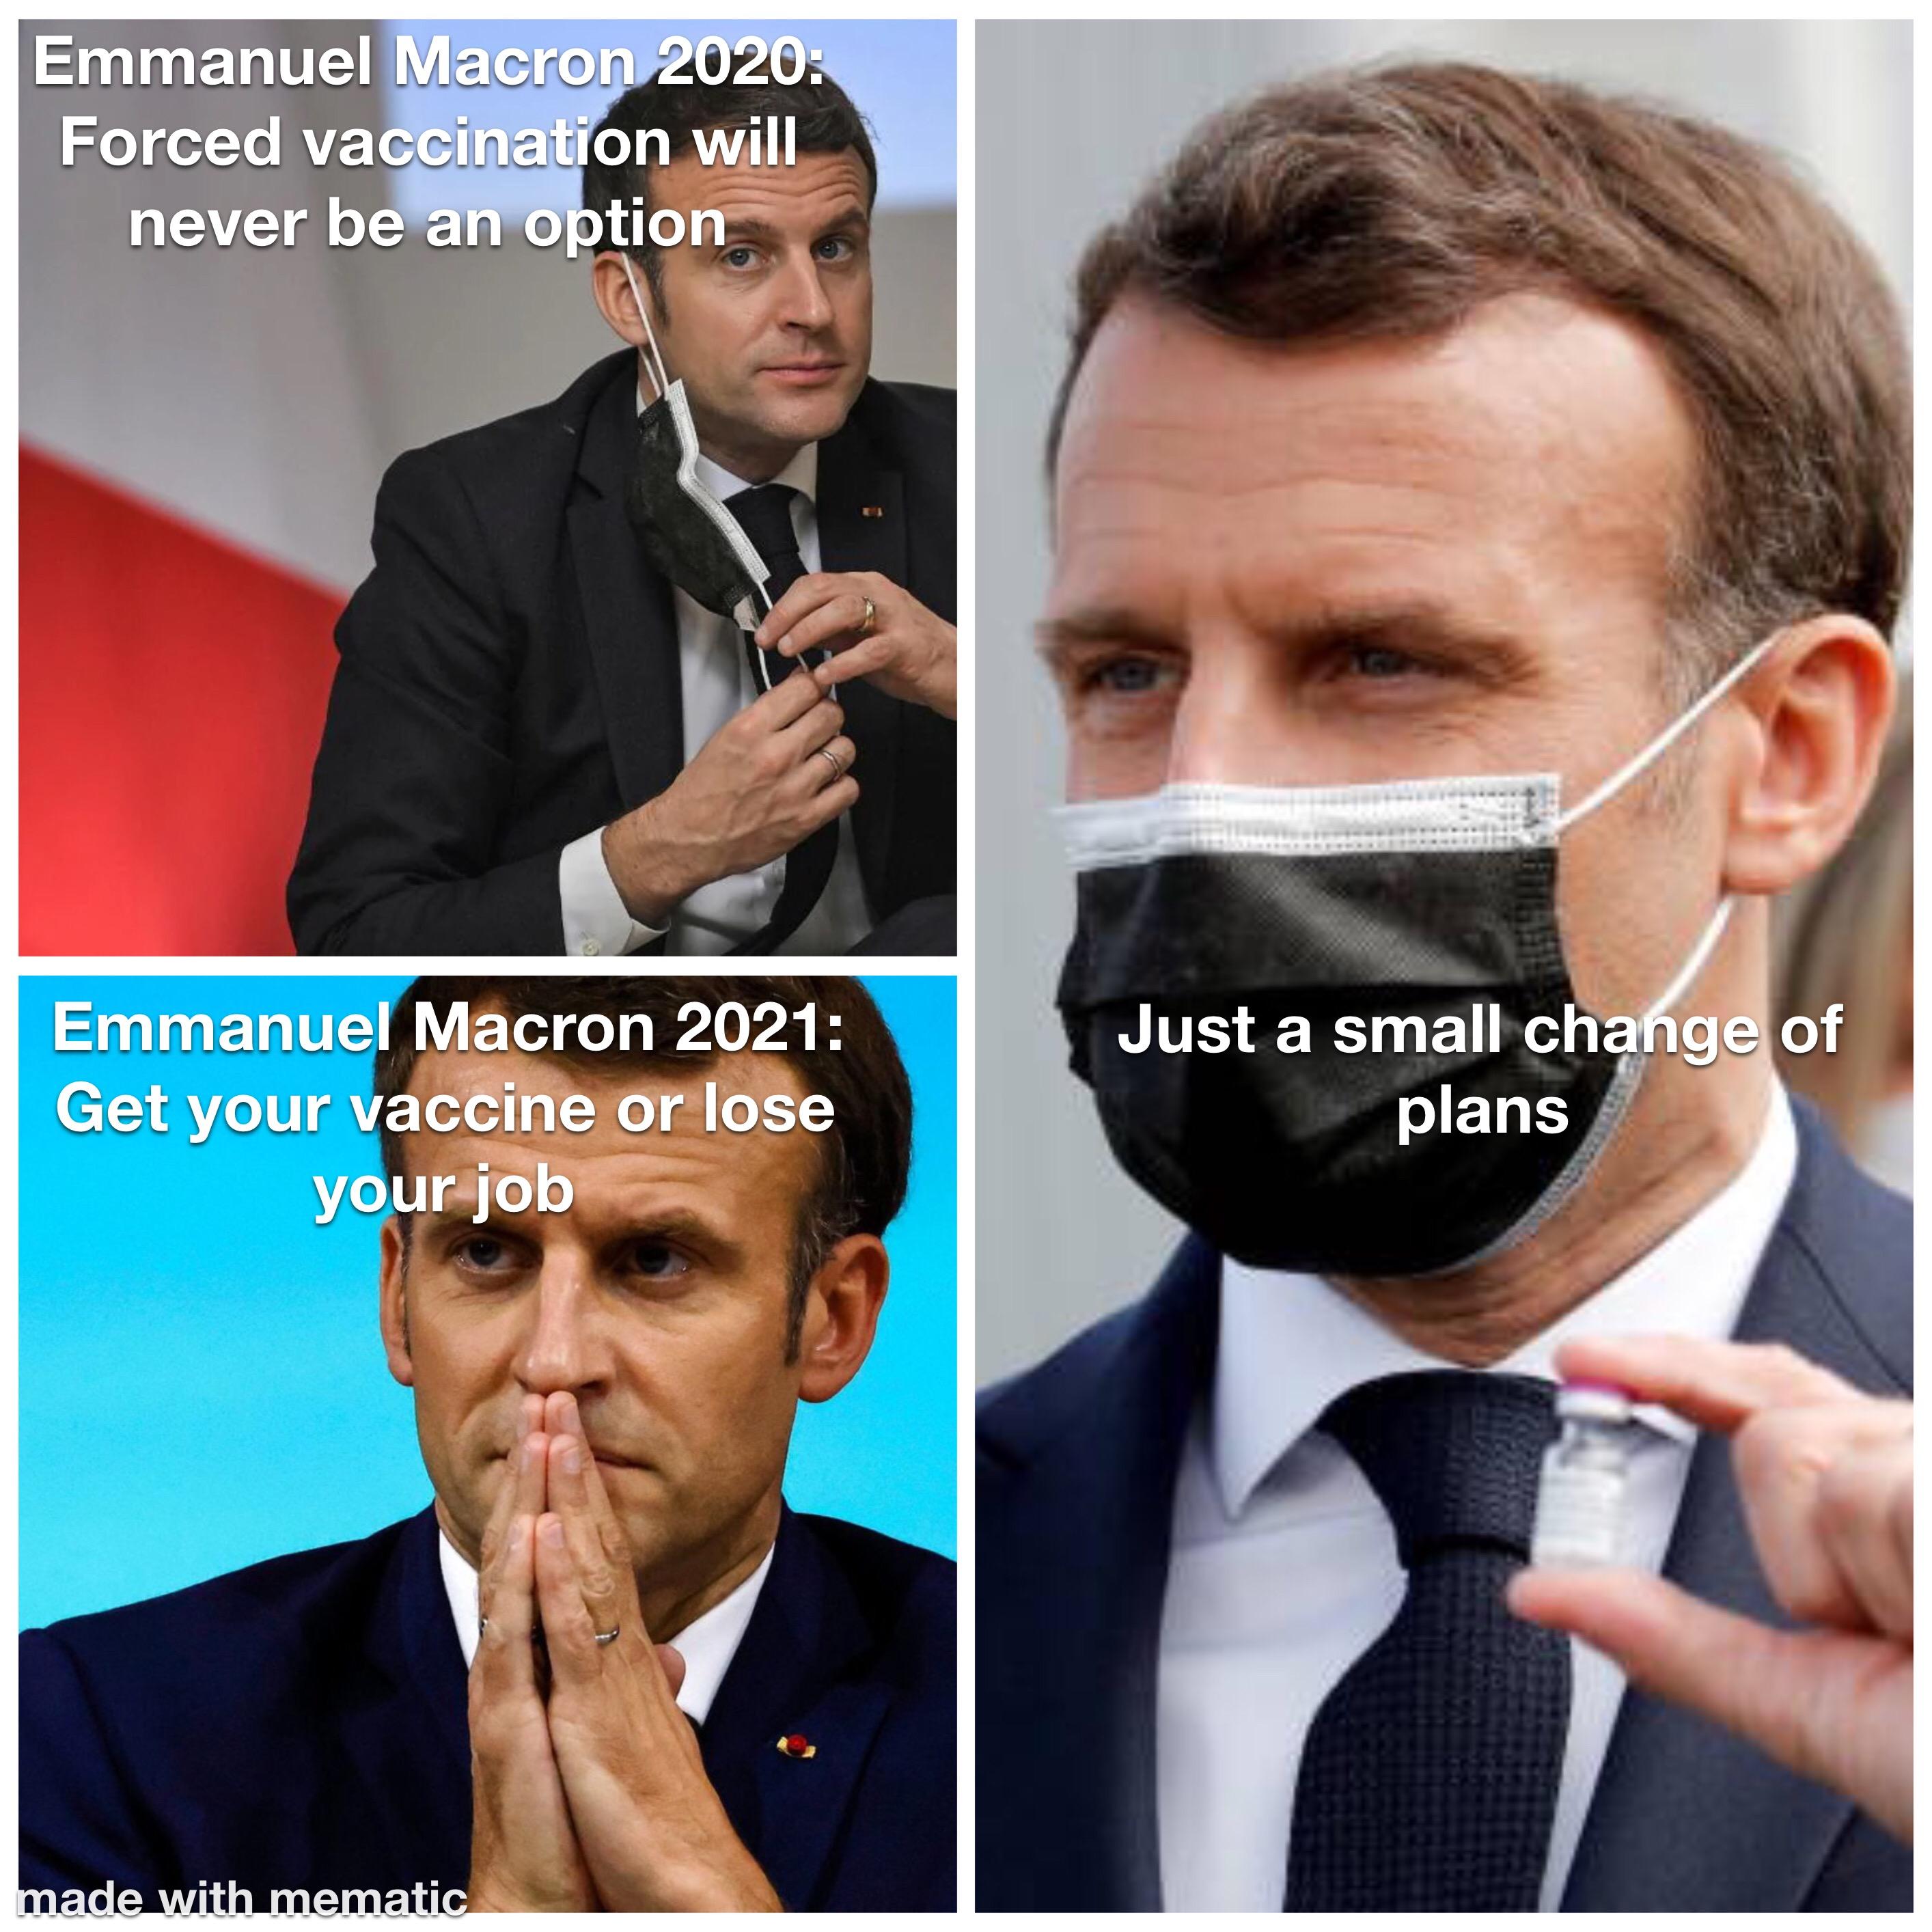 Macron vs. Macron